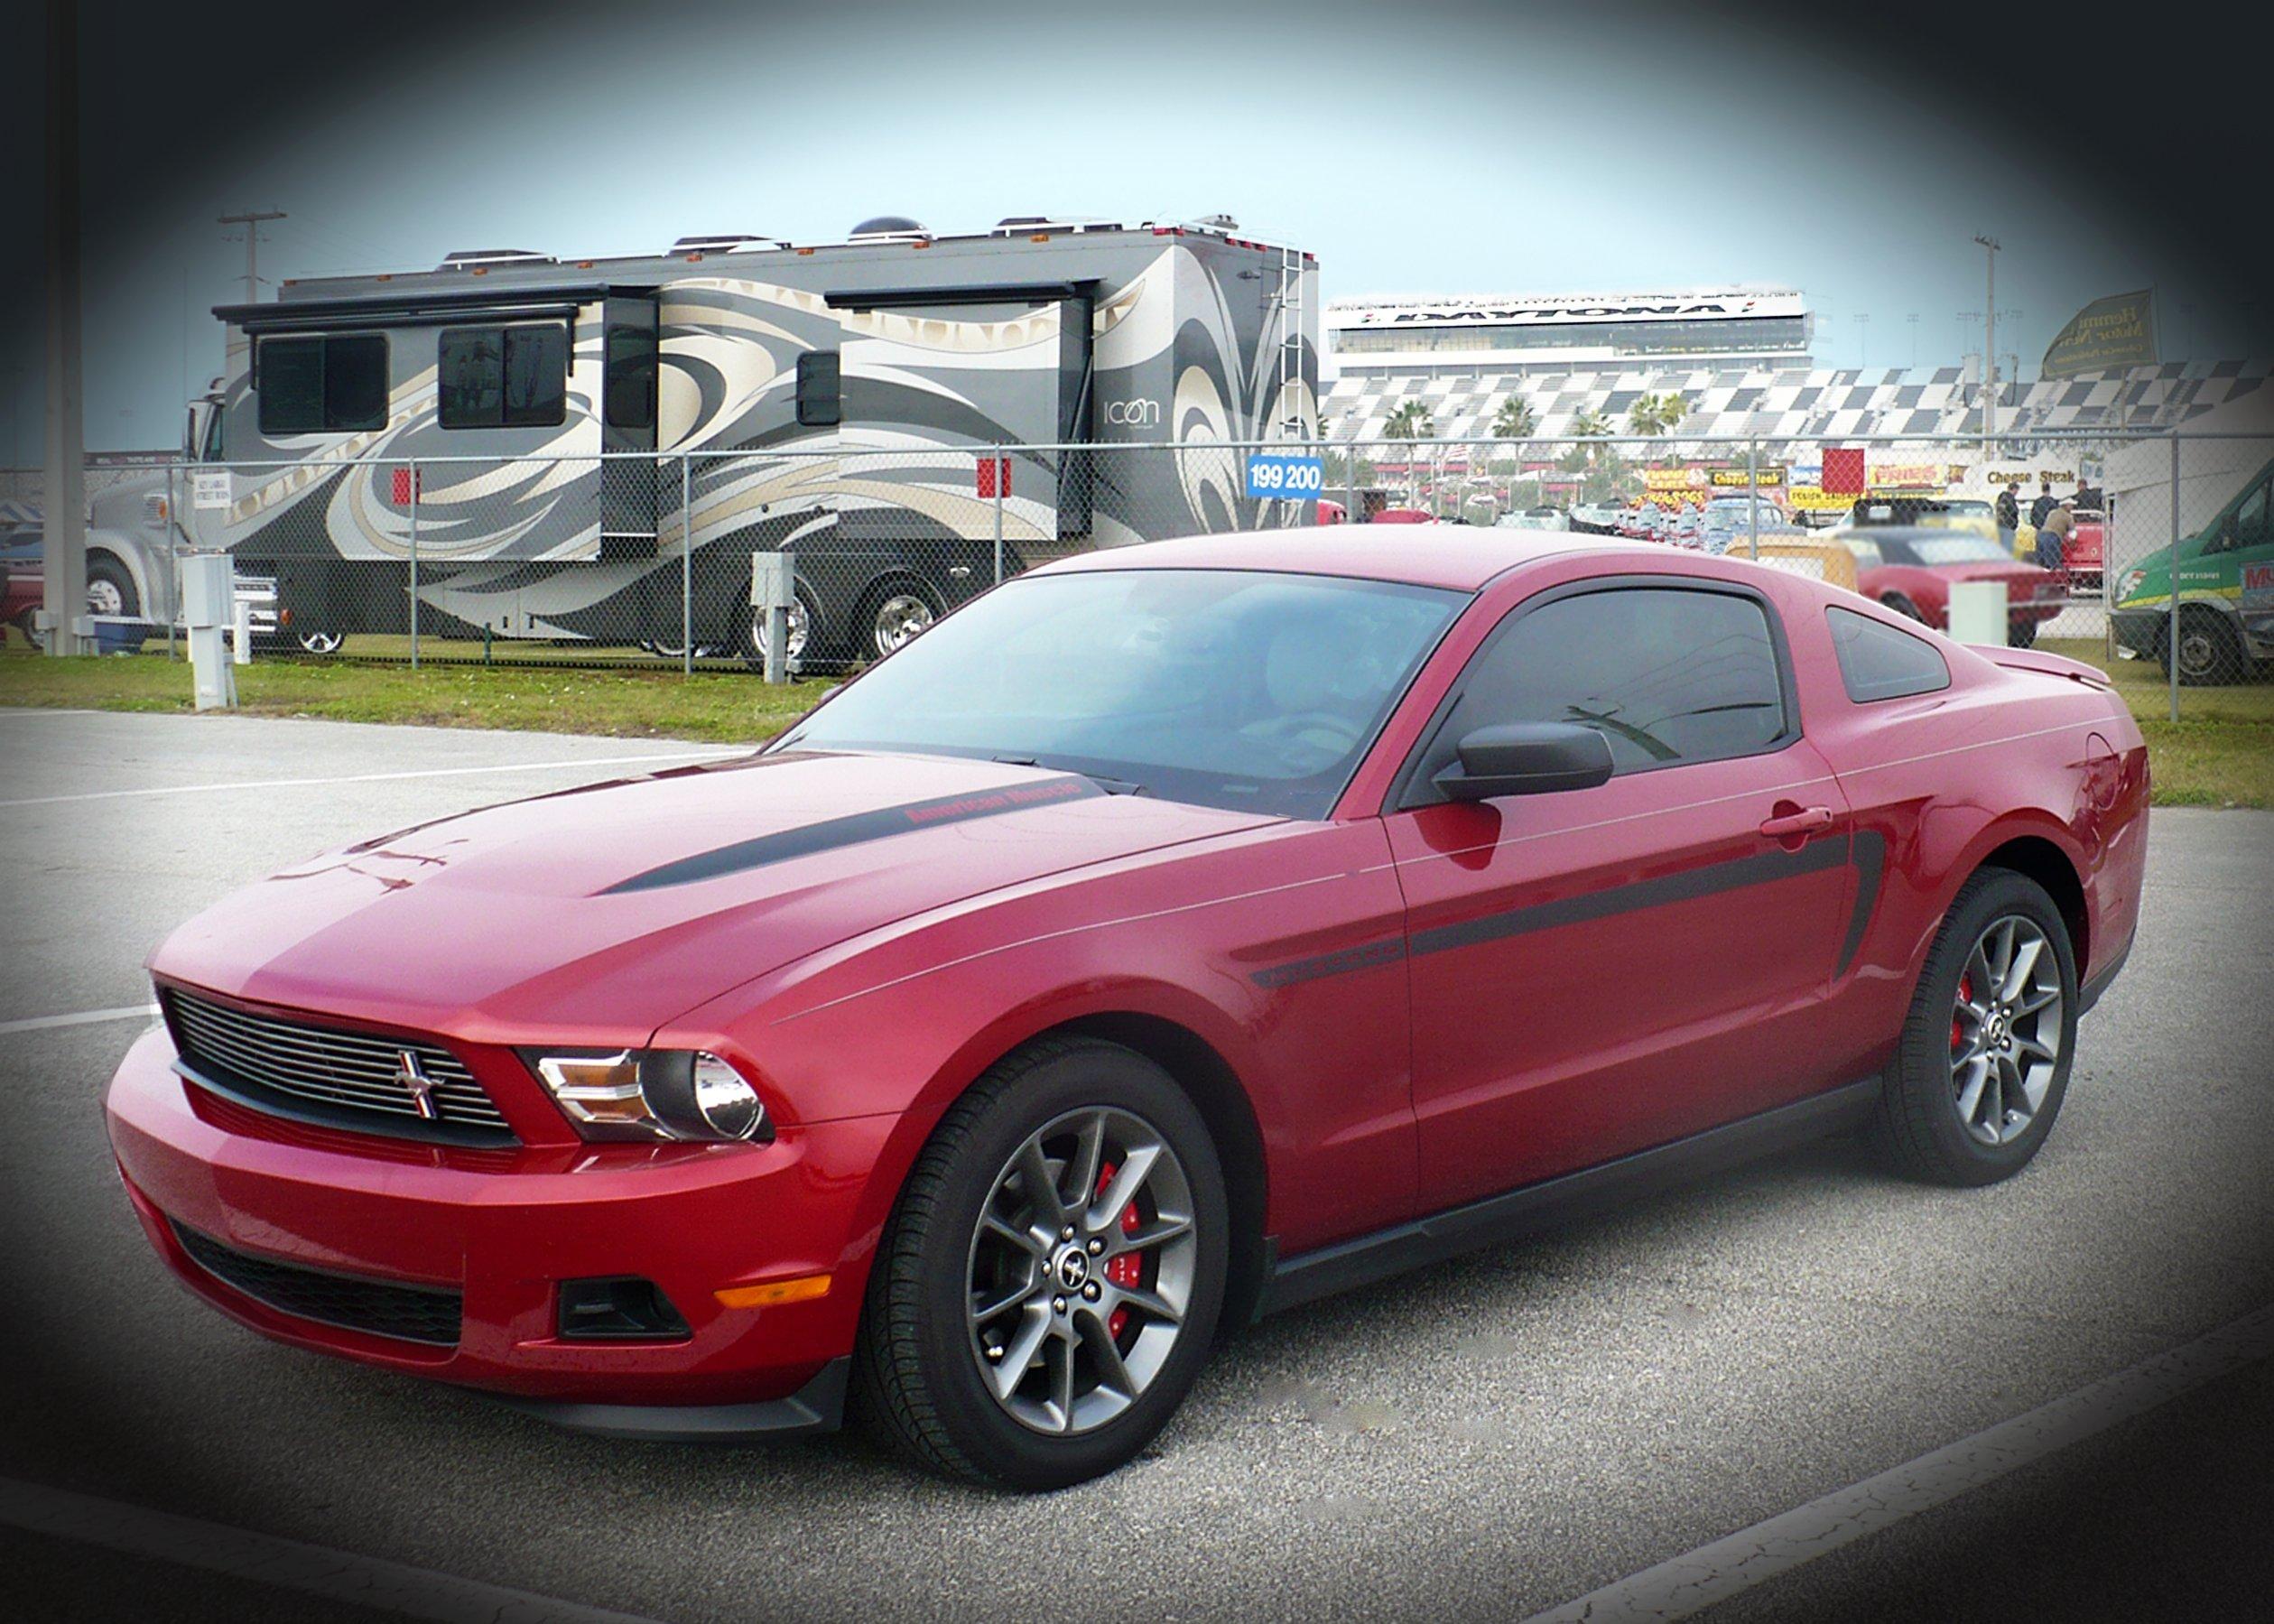 Click image for larger version  Name:Daytona Mustang.jpg Views:31 Size:641.3 KB ID:203770